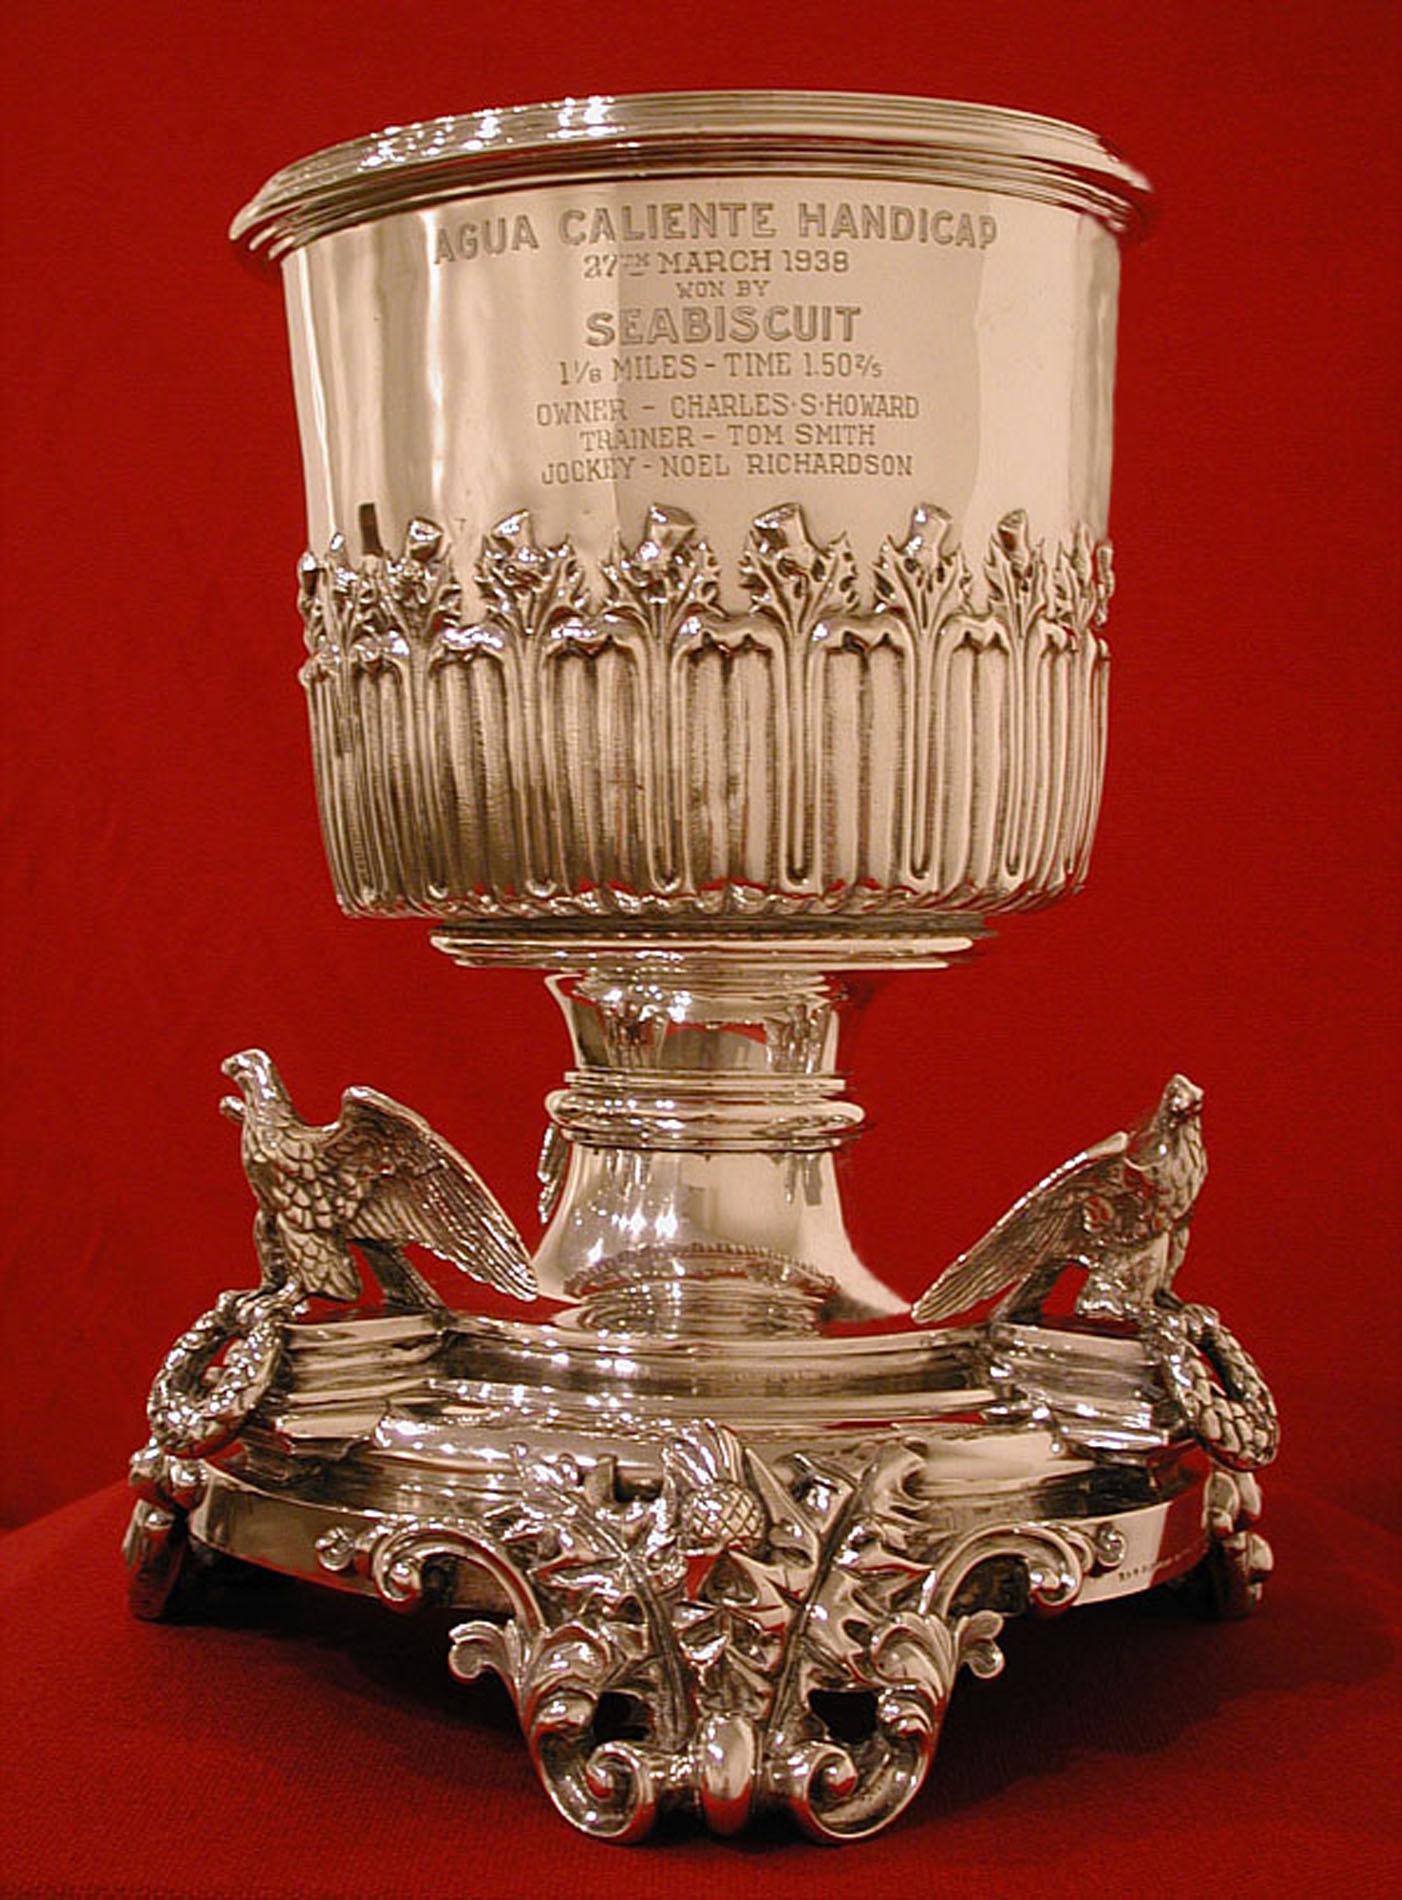 2002.8: Agua Caliente Handicap, 1938, won by Seabiscuit, Gift: Lt. Col. Mike Howard